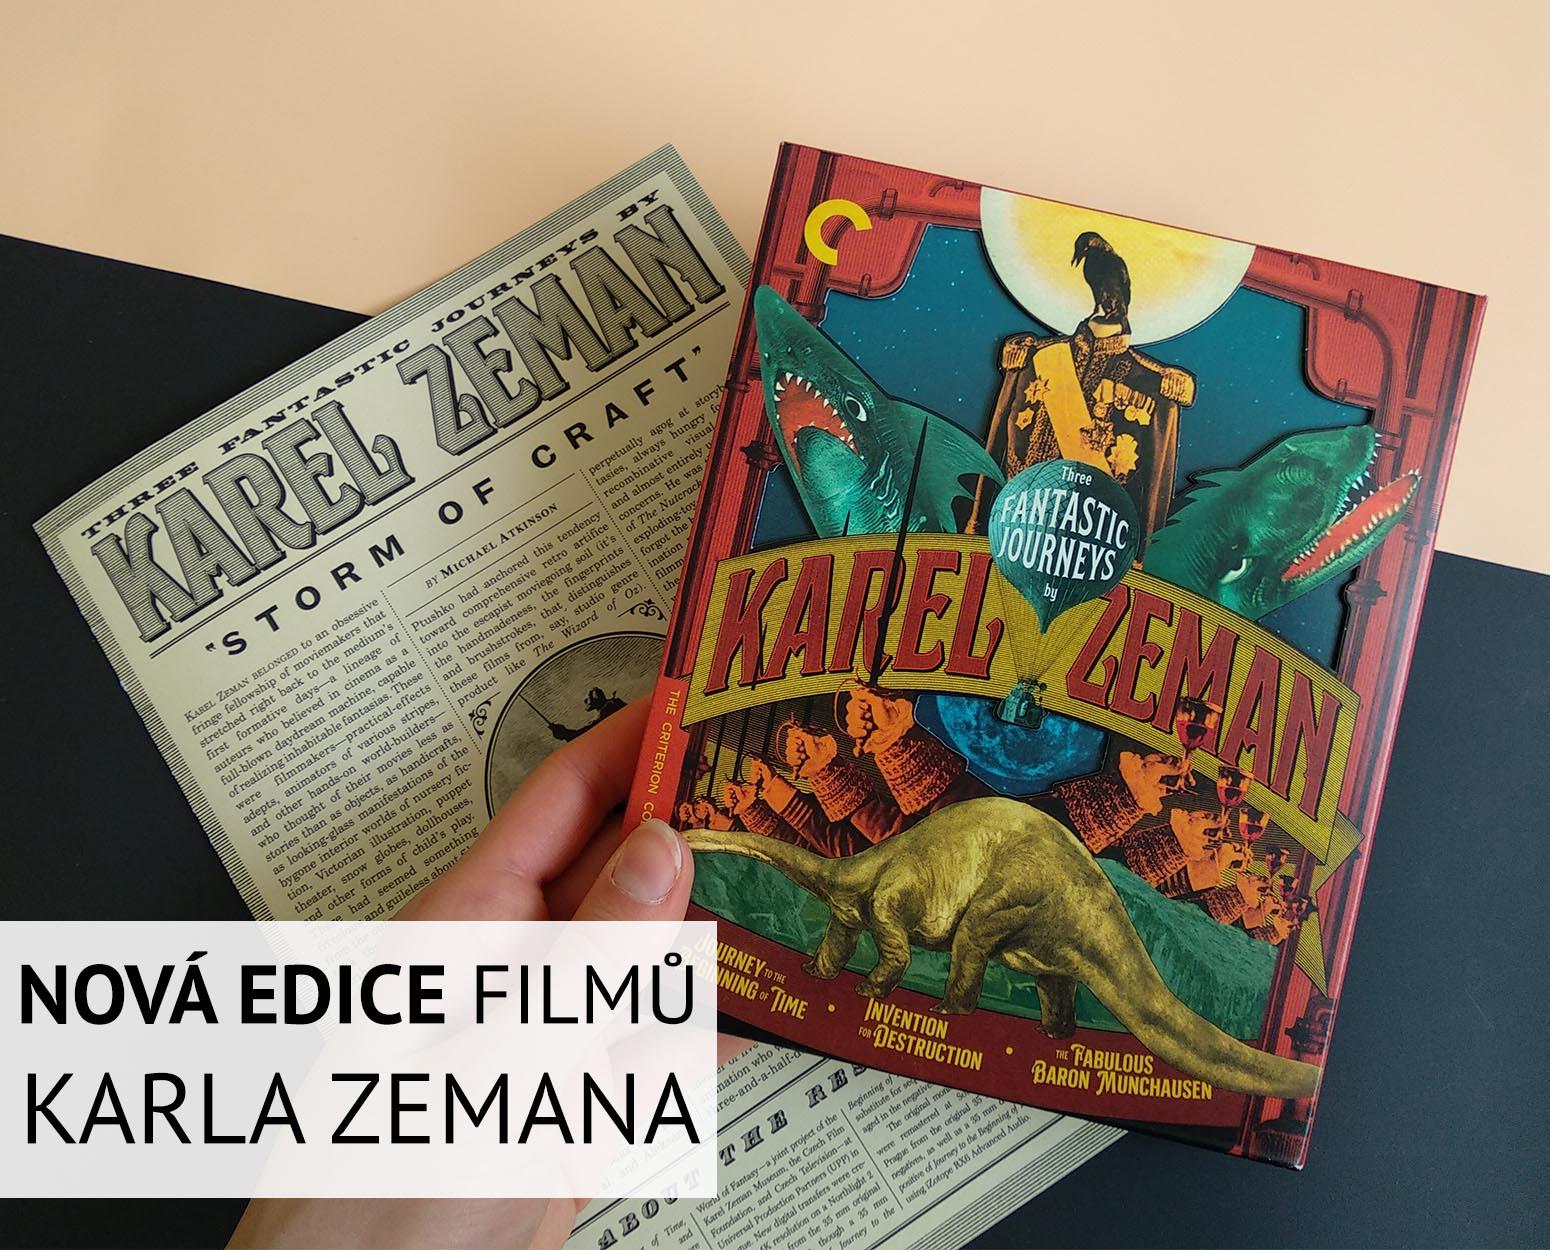 Nová edice filmů Karla Zemana